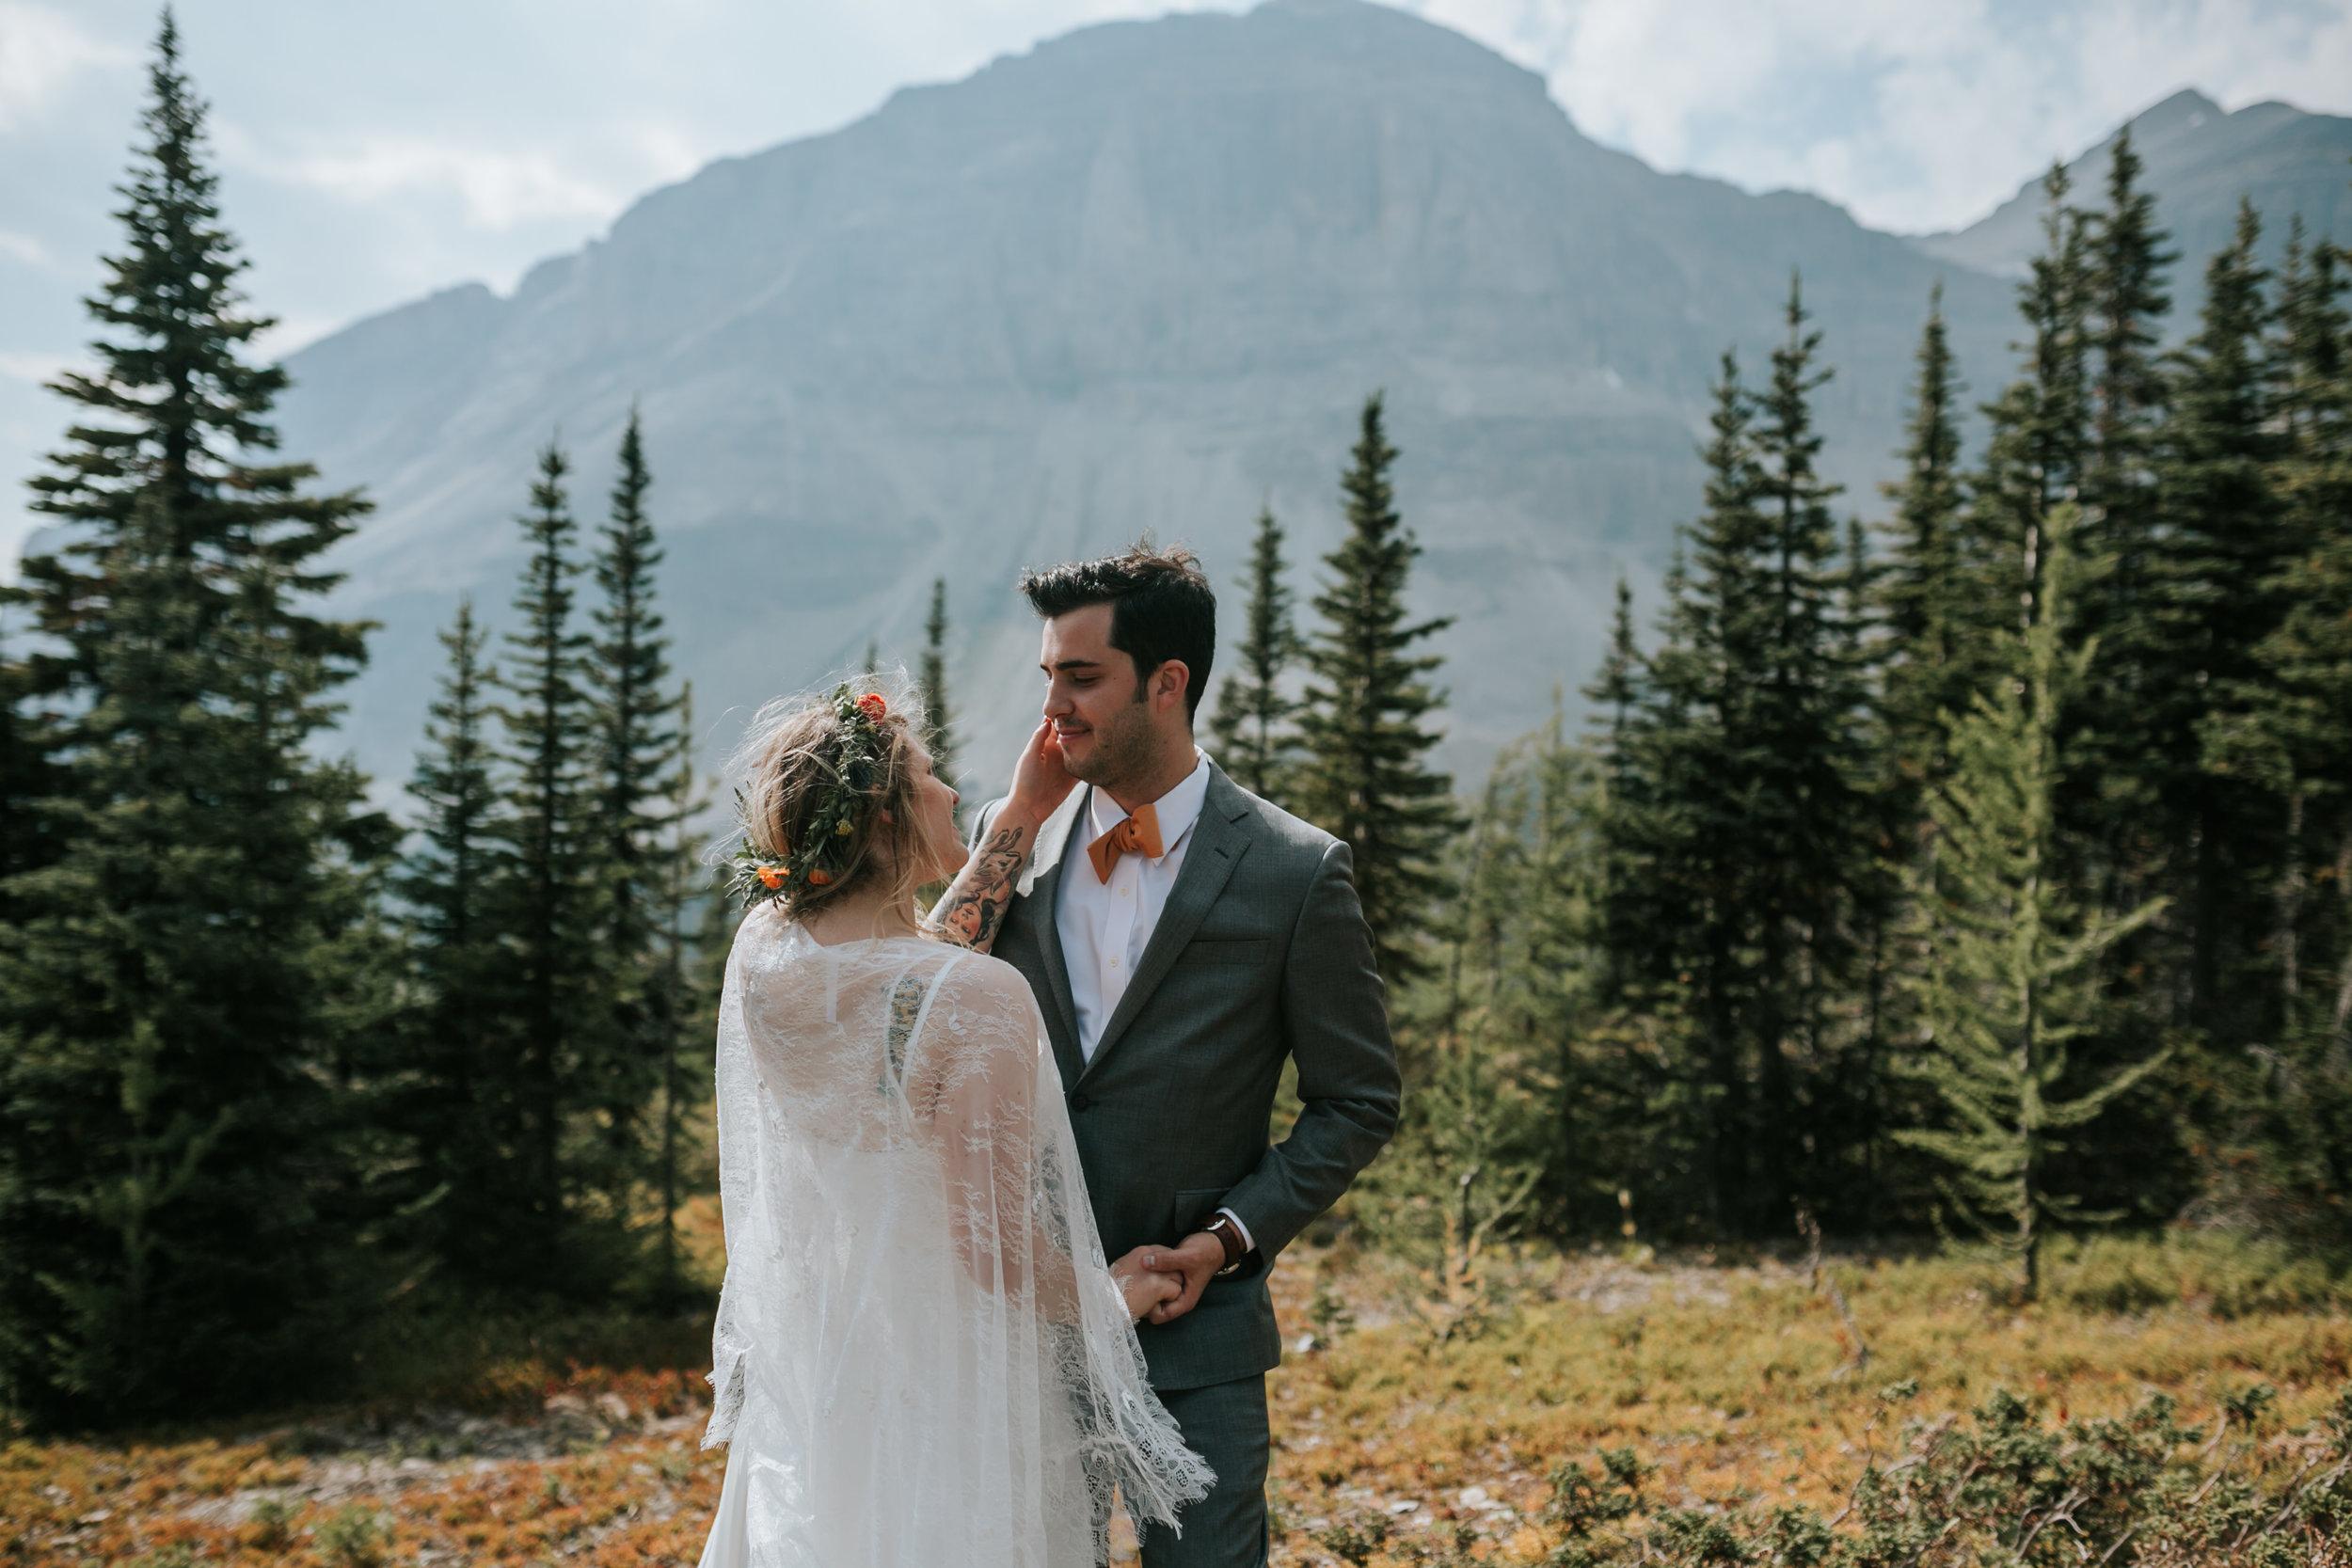 Banff National Park, Alberta Canada Elopement - Grace and Jaden Photography (106).jpg